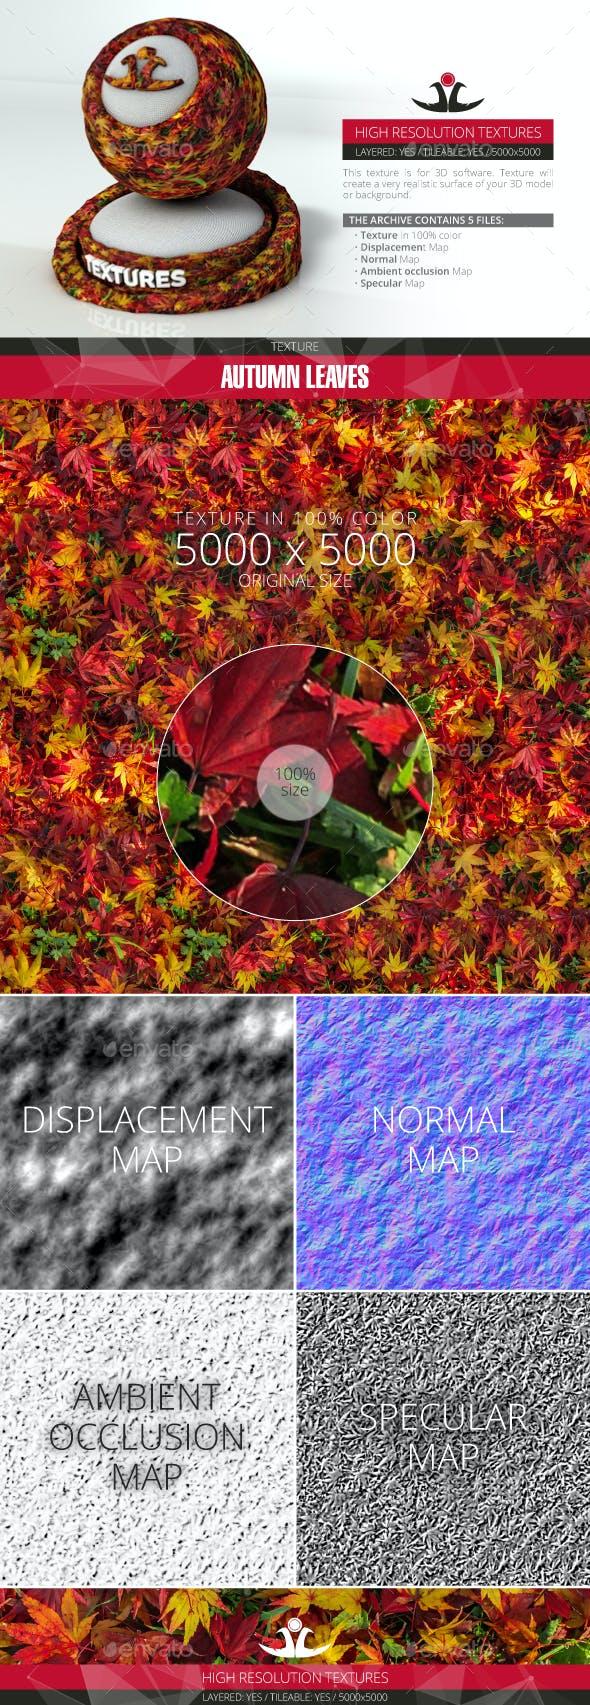 Autumn Leaves 13 - 3DOcean Item for Sale